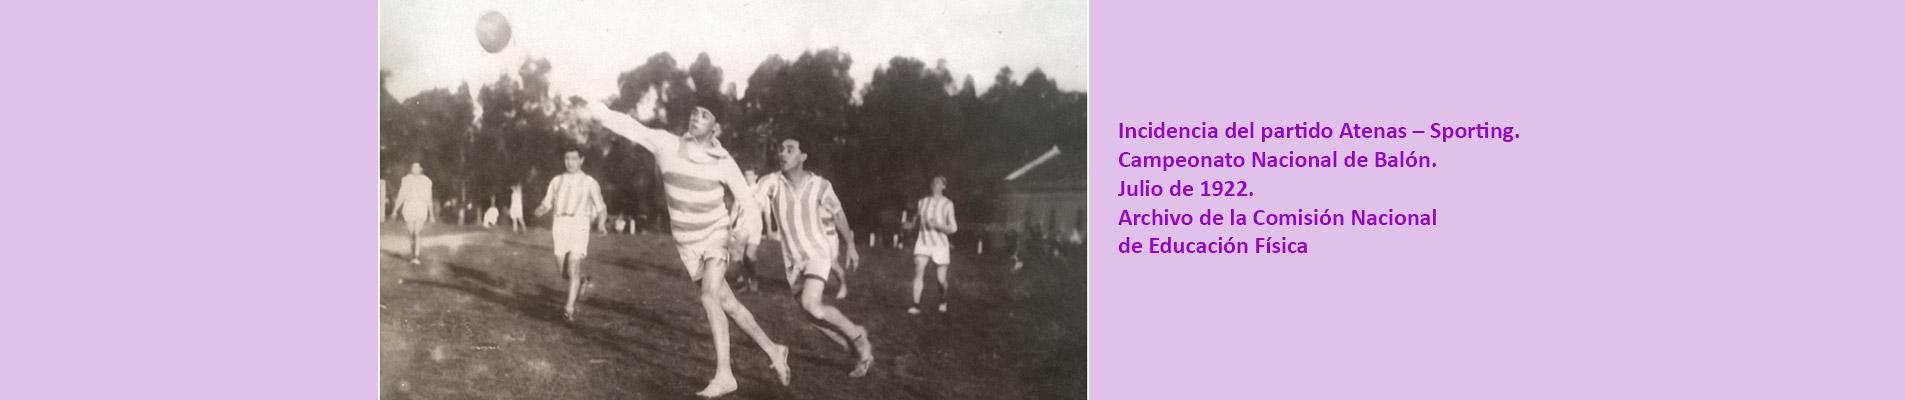 balonmano-banner-1920-1-1